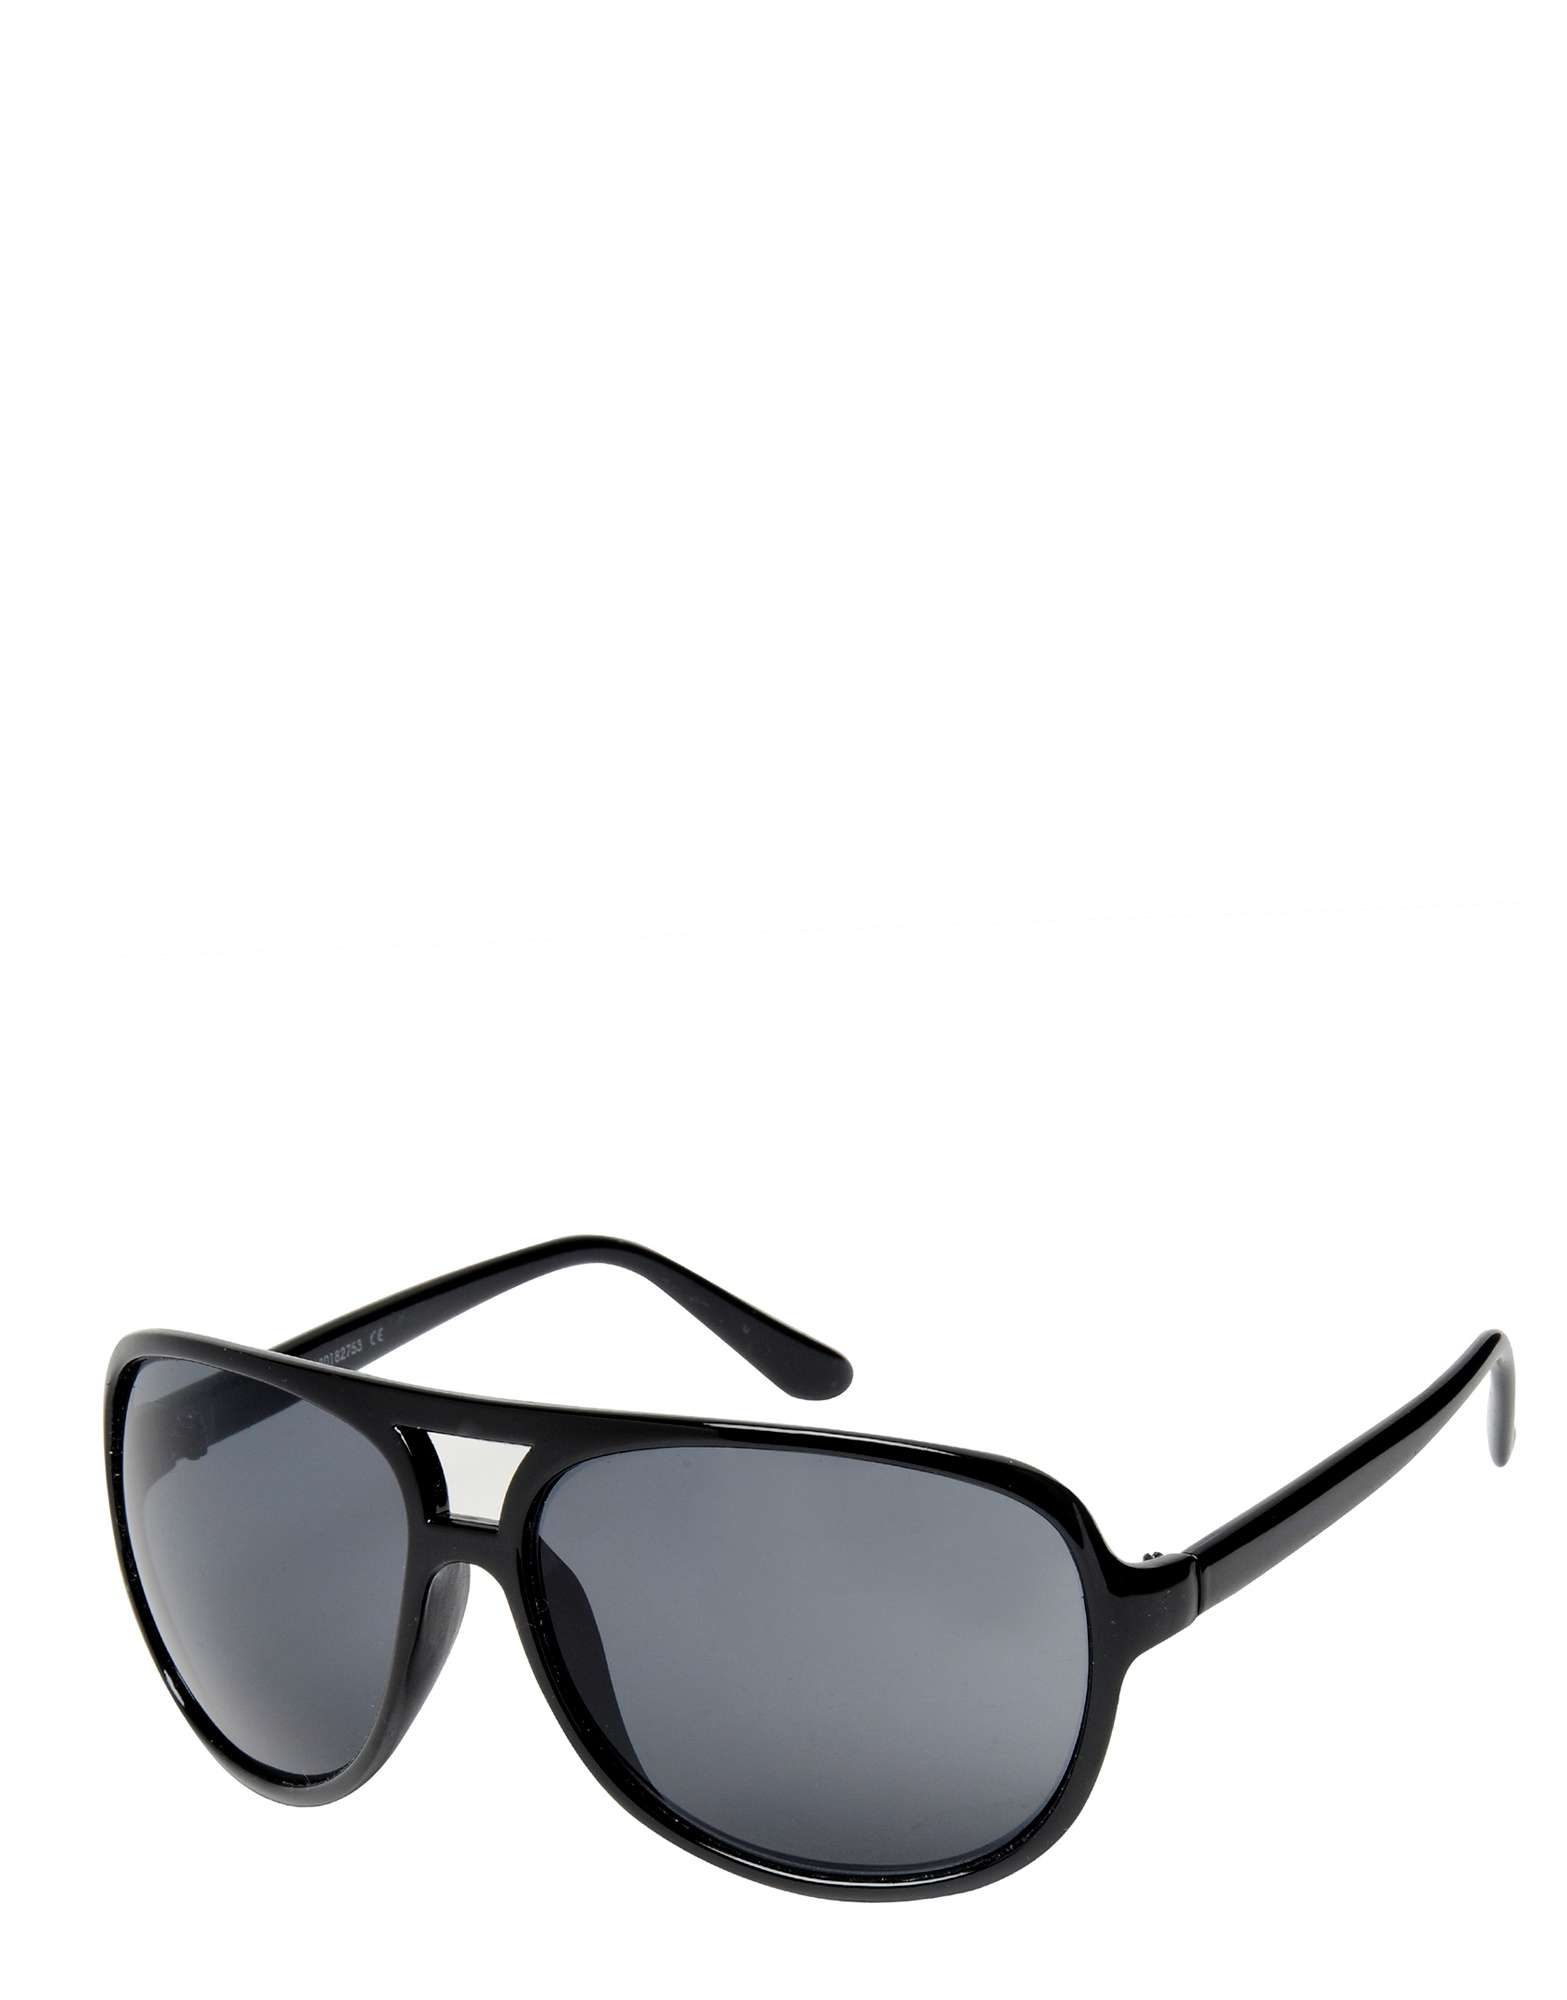 Brookhaven Ollie Sunglasses